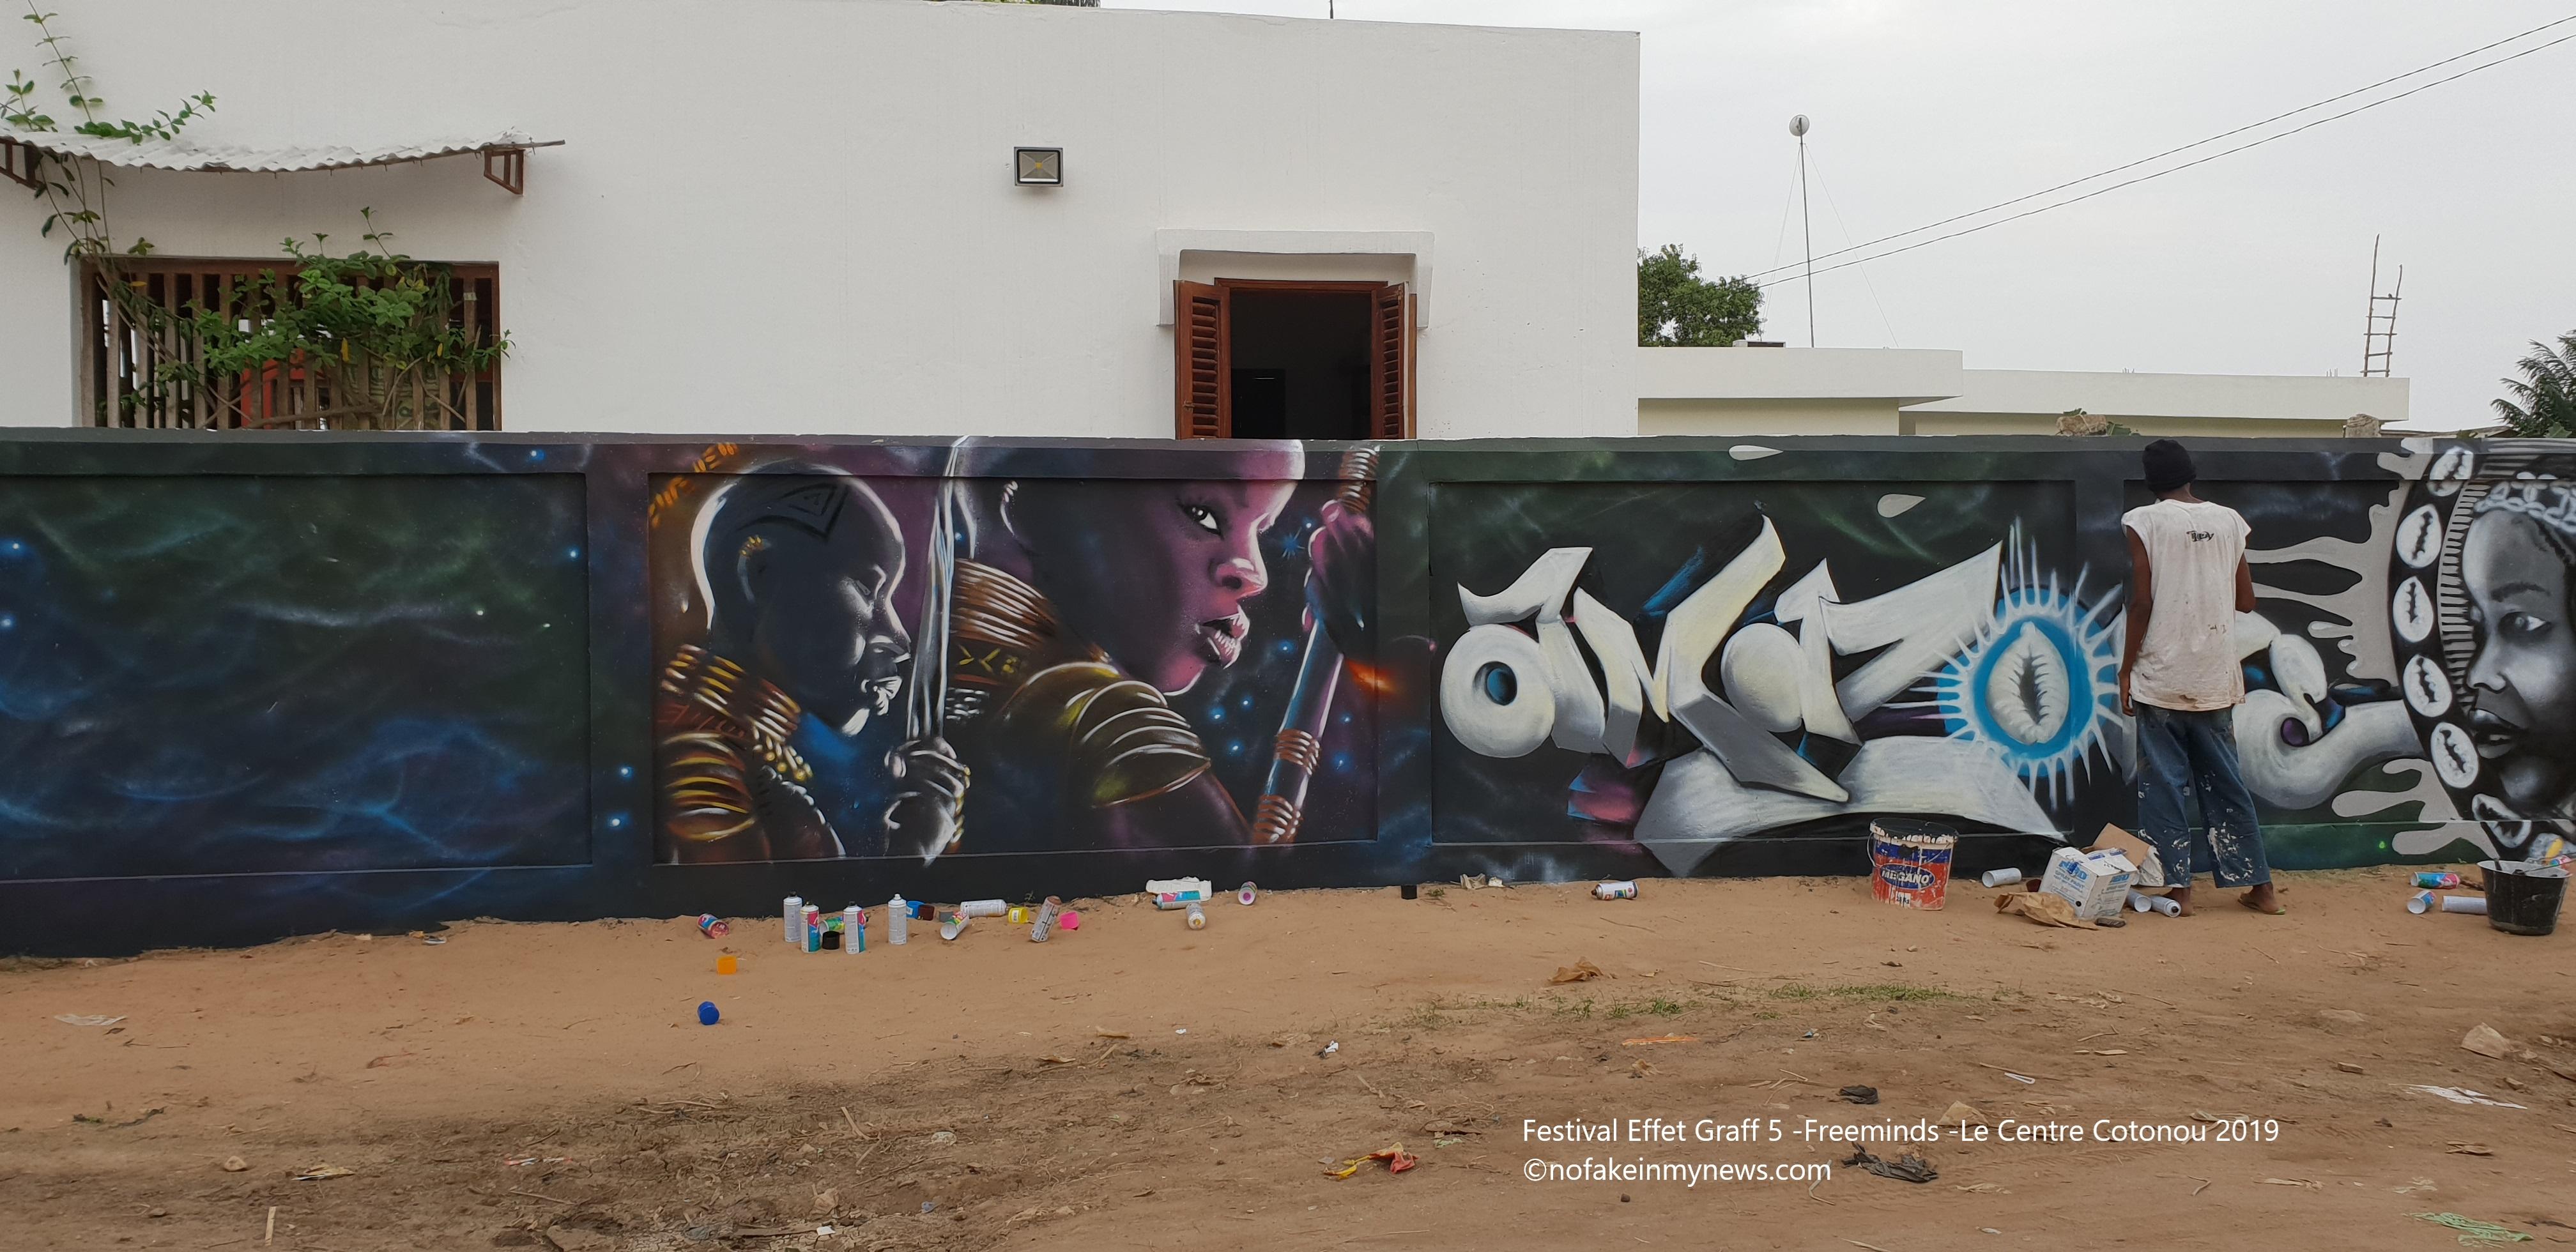 Festival Effet Graff 5 -Freeminds -Le Centre Cotonou 2019 - ©nofakeinmynews